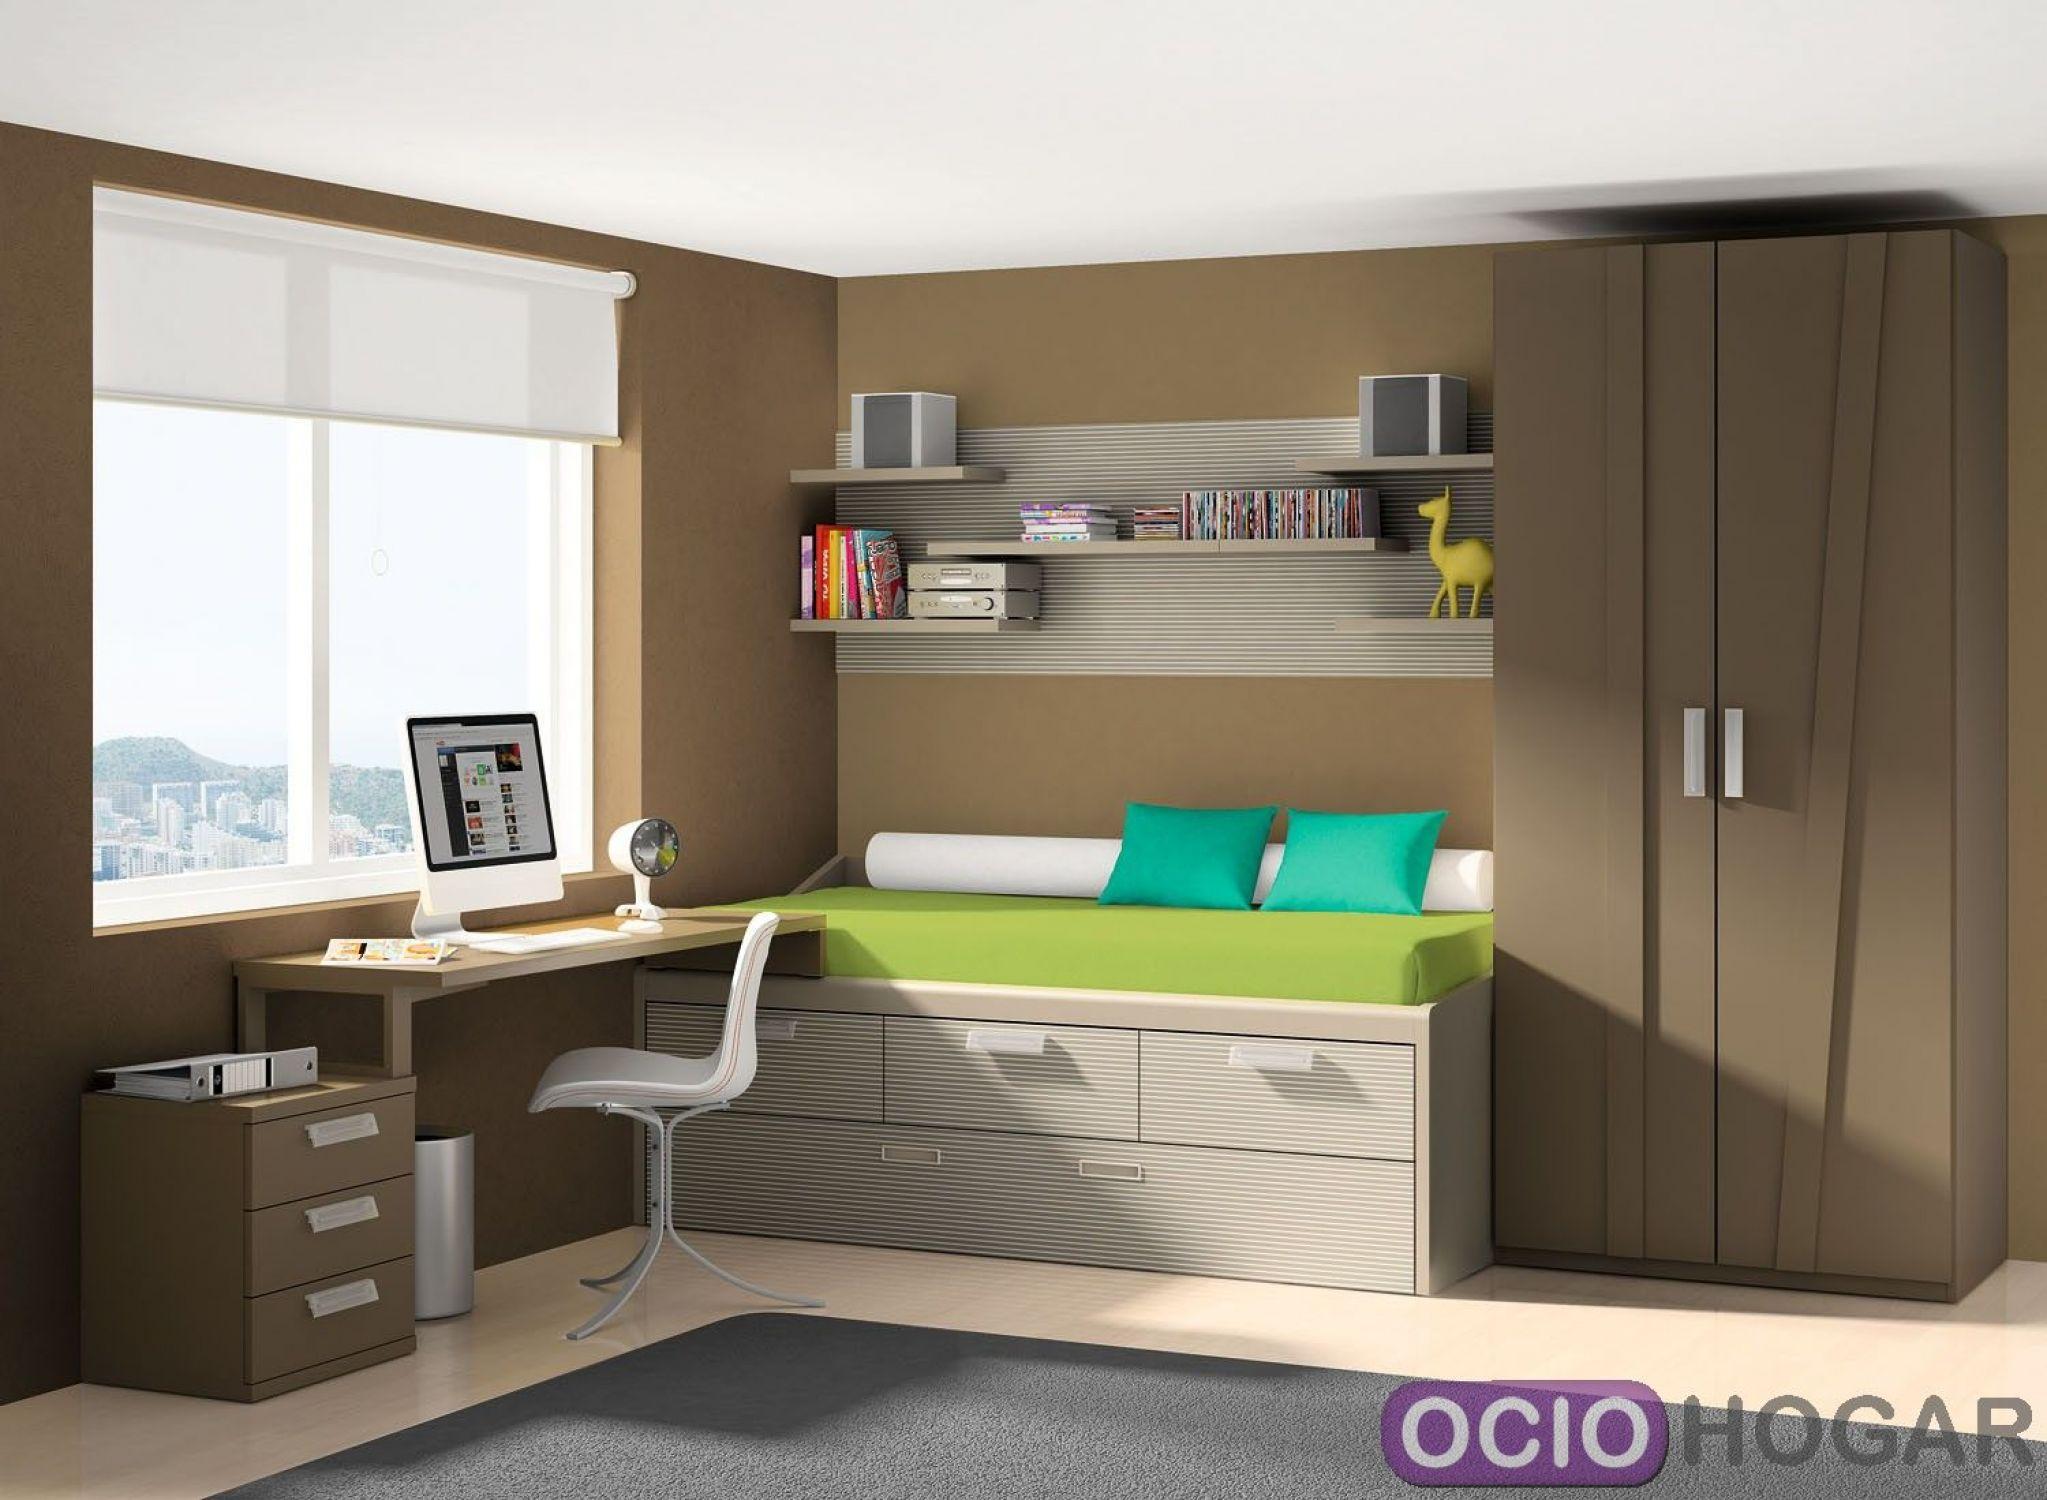 Dormitorio juvenil delta de dissery for Muebles juveniles